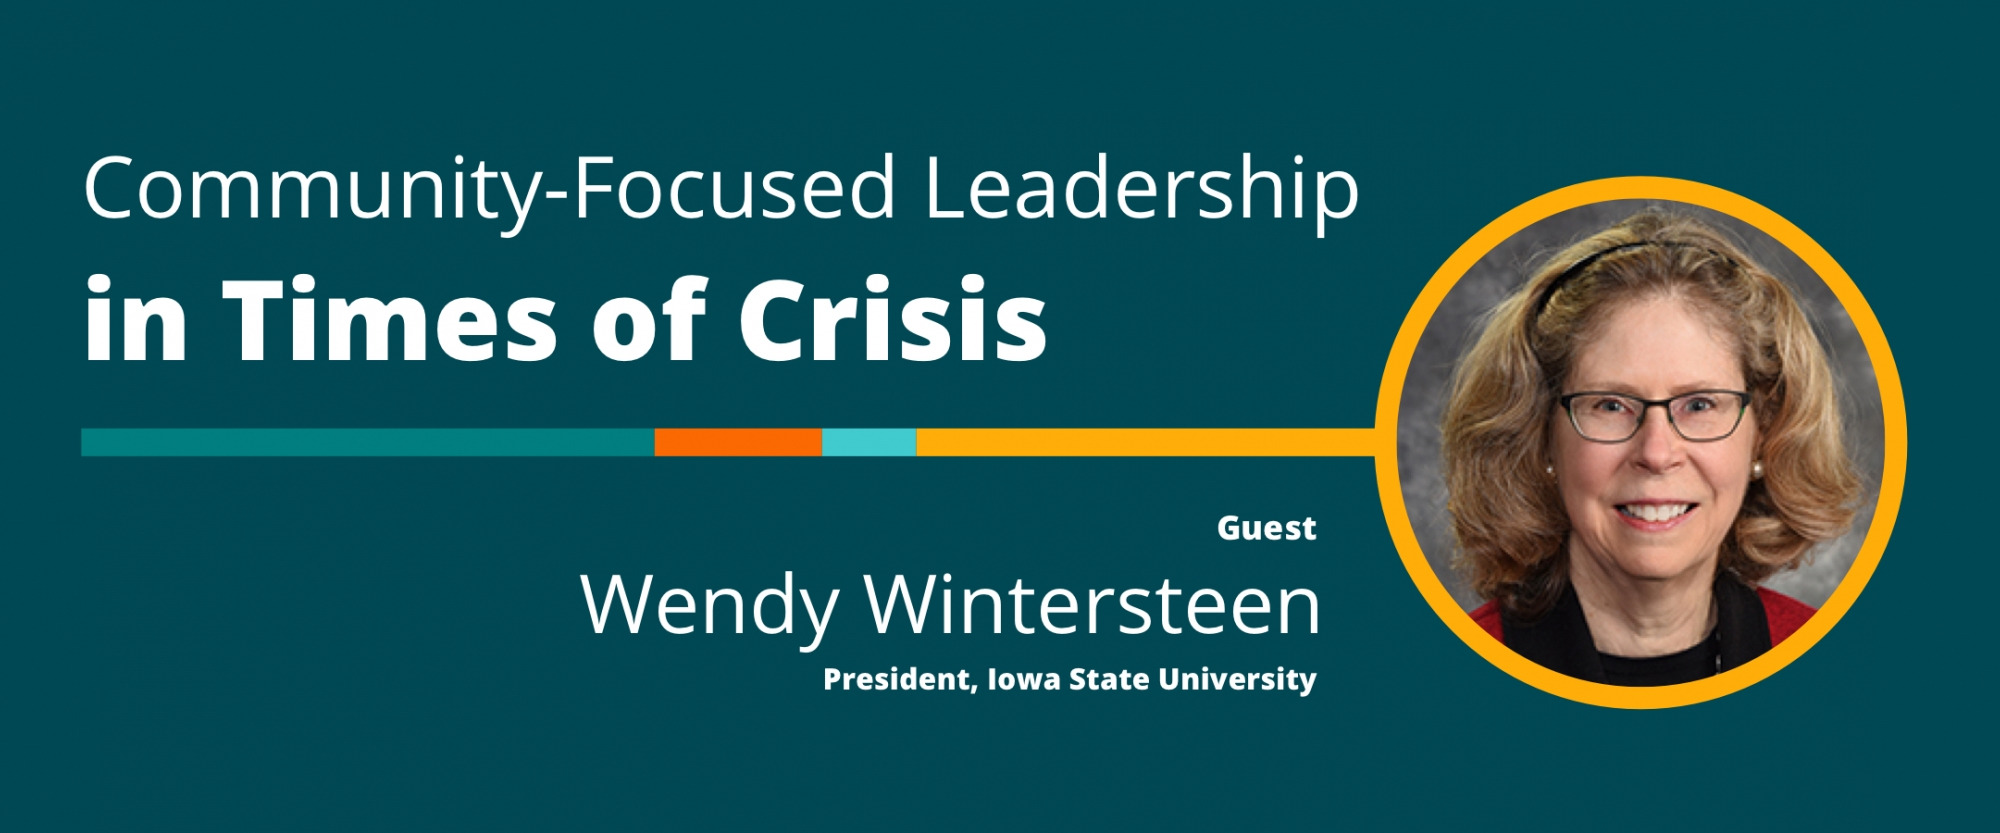 Community-Focused Leadership in Times of Crisis